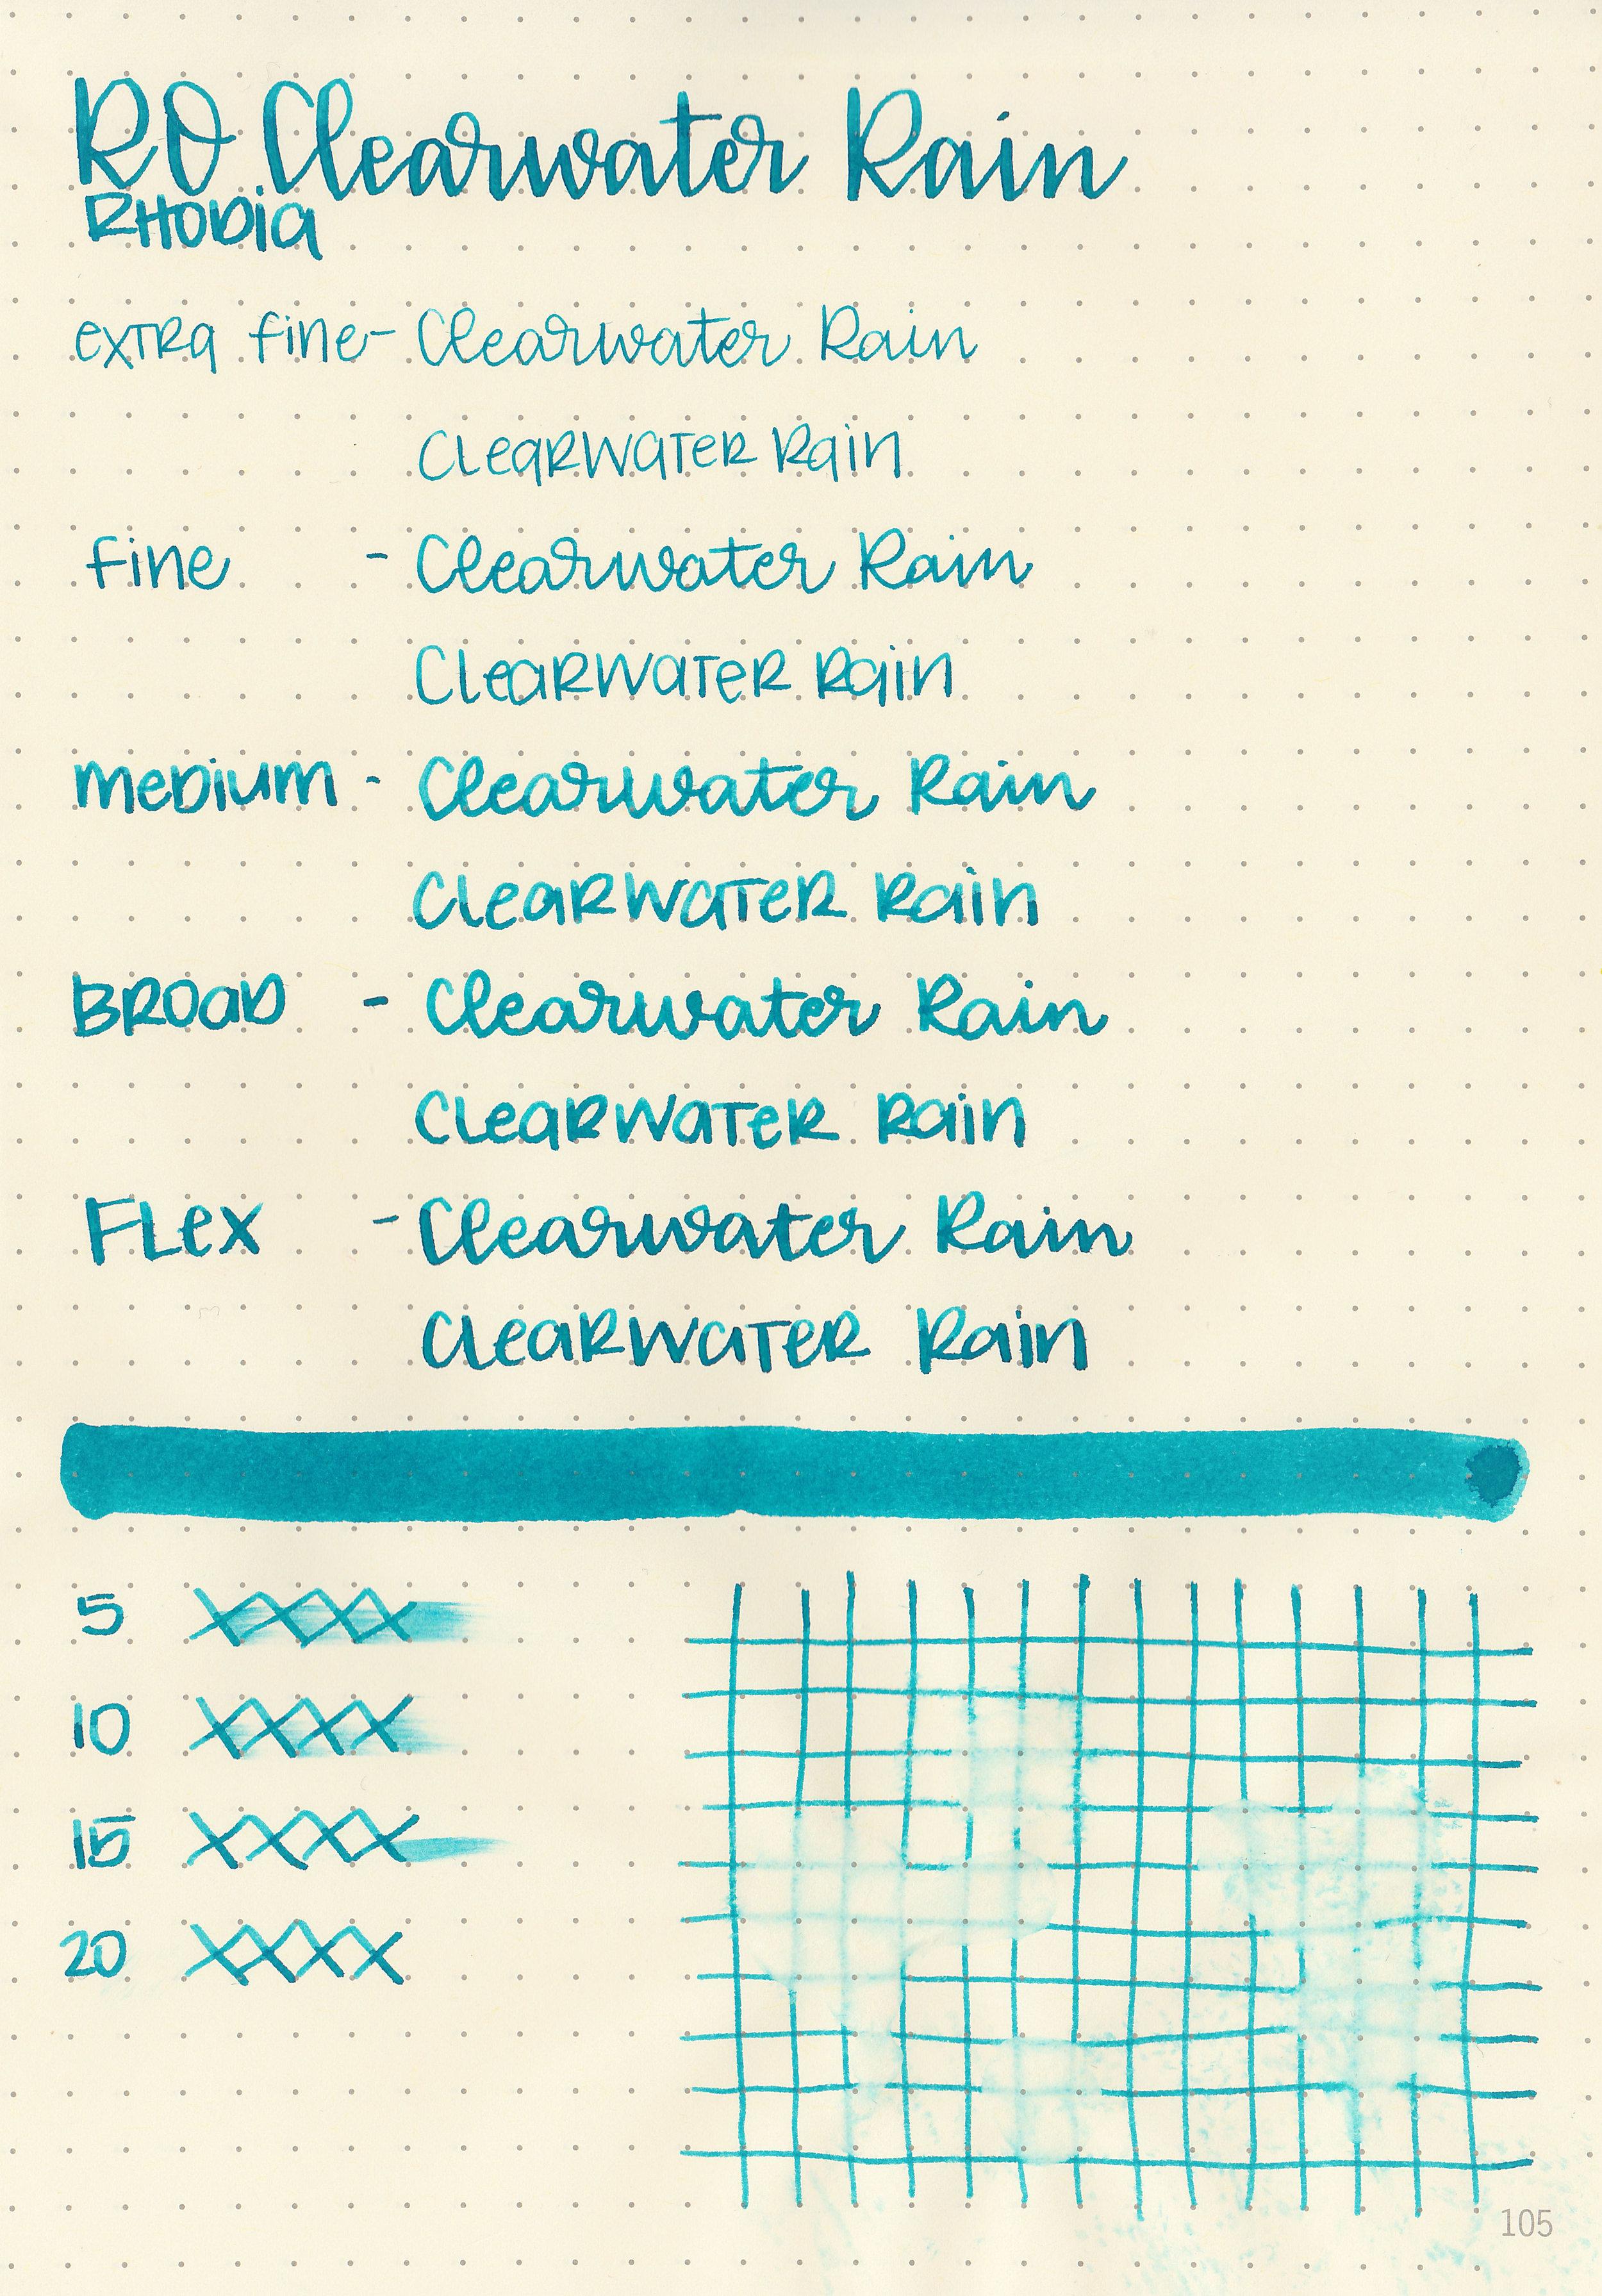 ro-clearwater-rain-8.jpg